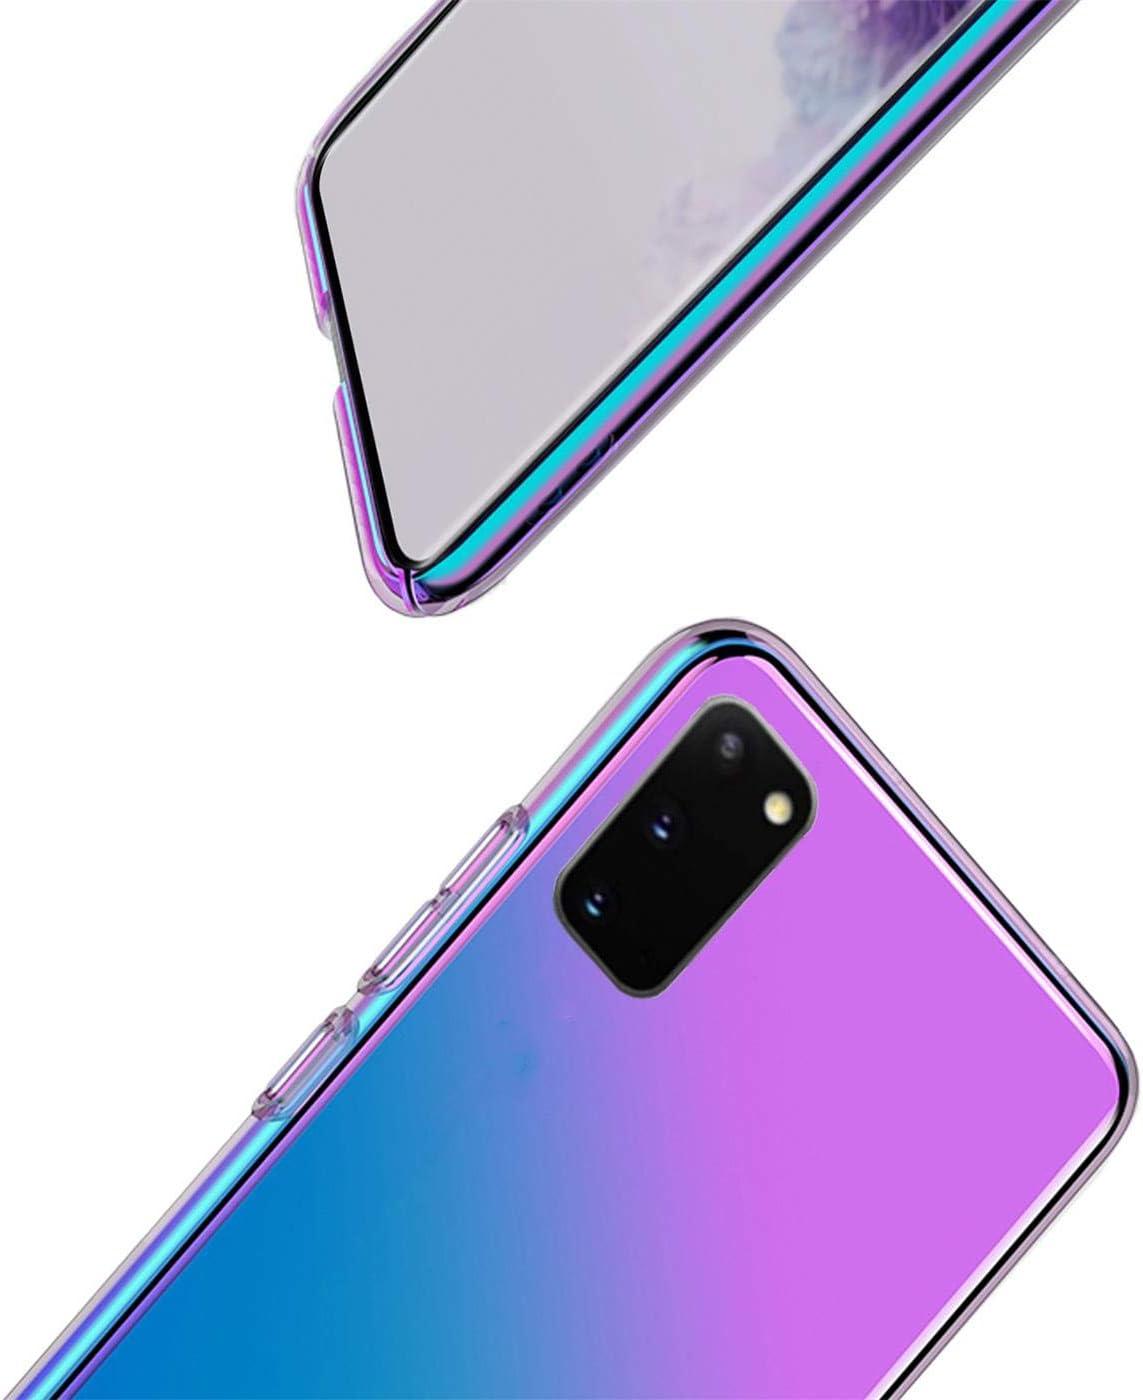 Carcasa Ultra Delgado Juego de Colores Protecci/ón Funda Verco Funda para Samsung Galaxy S20 Ultra